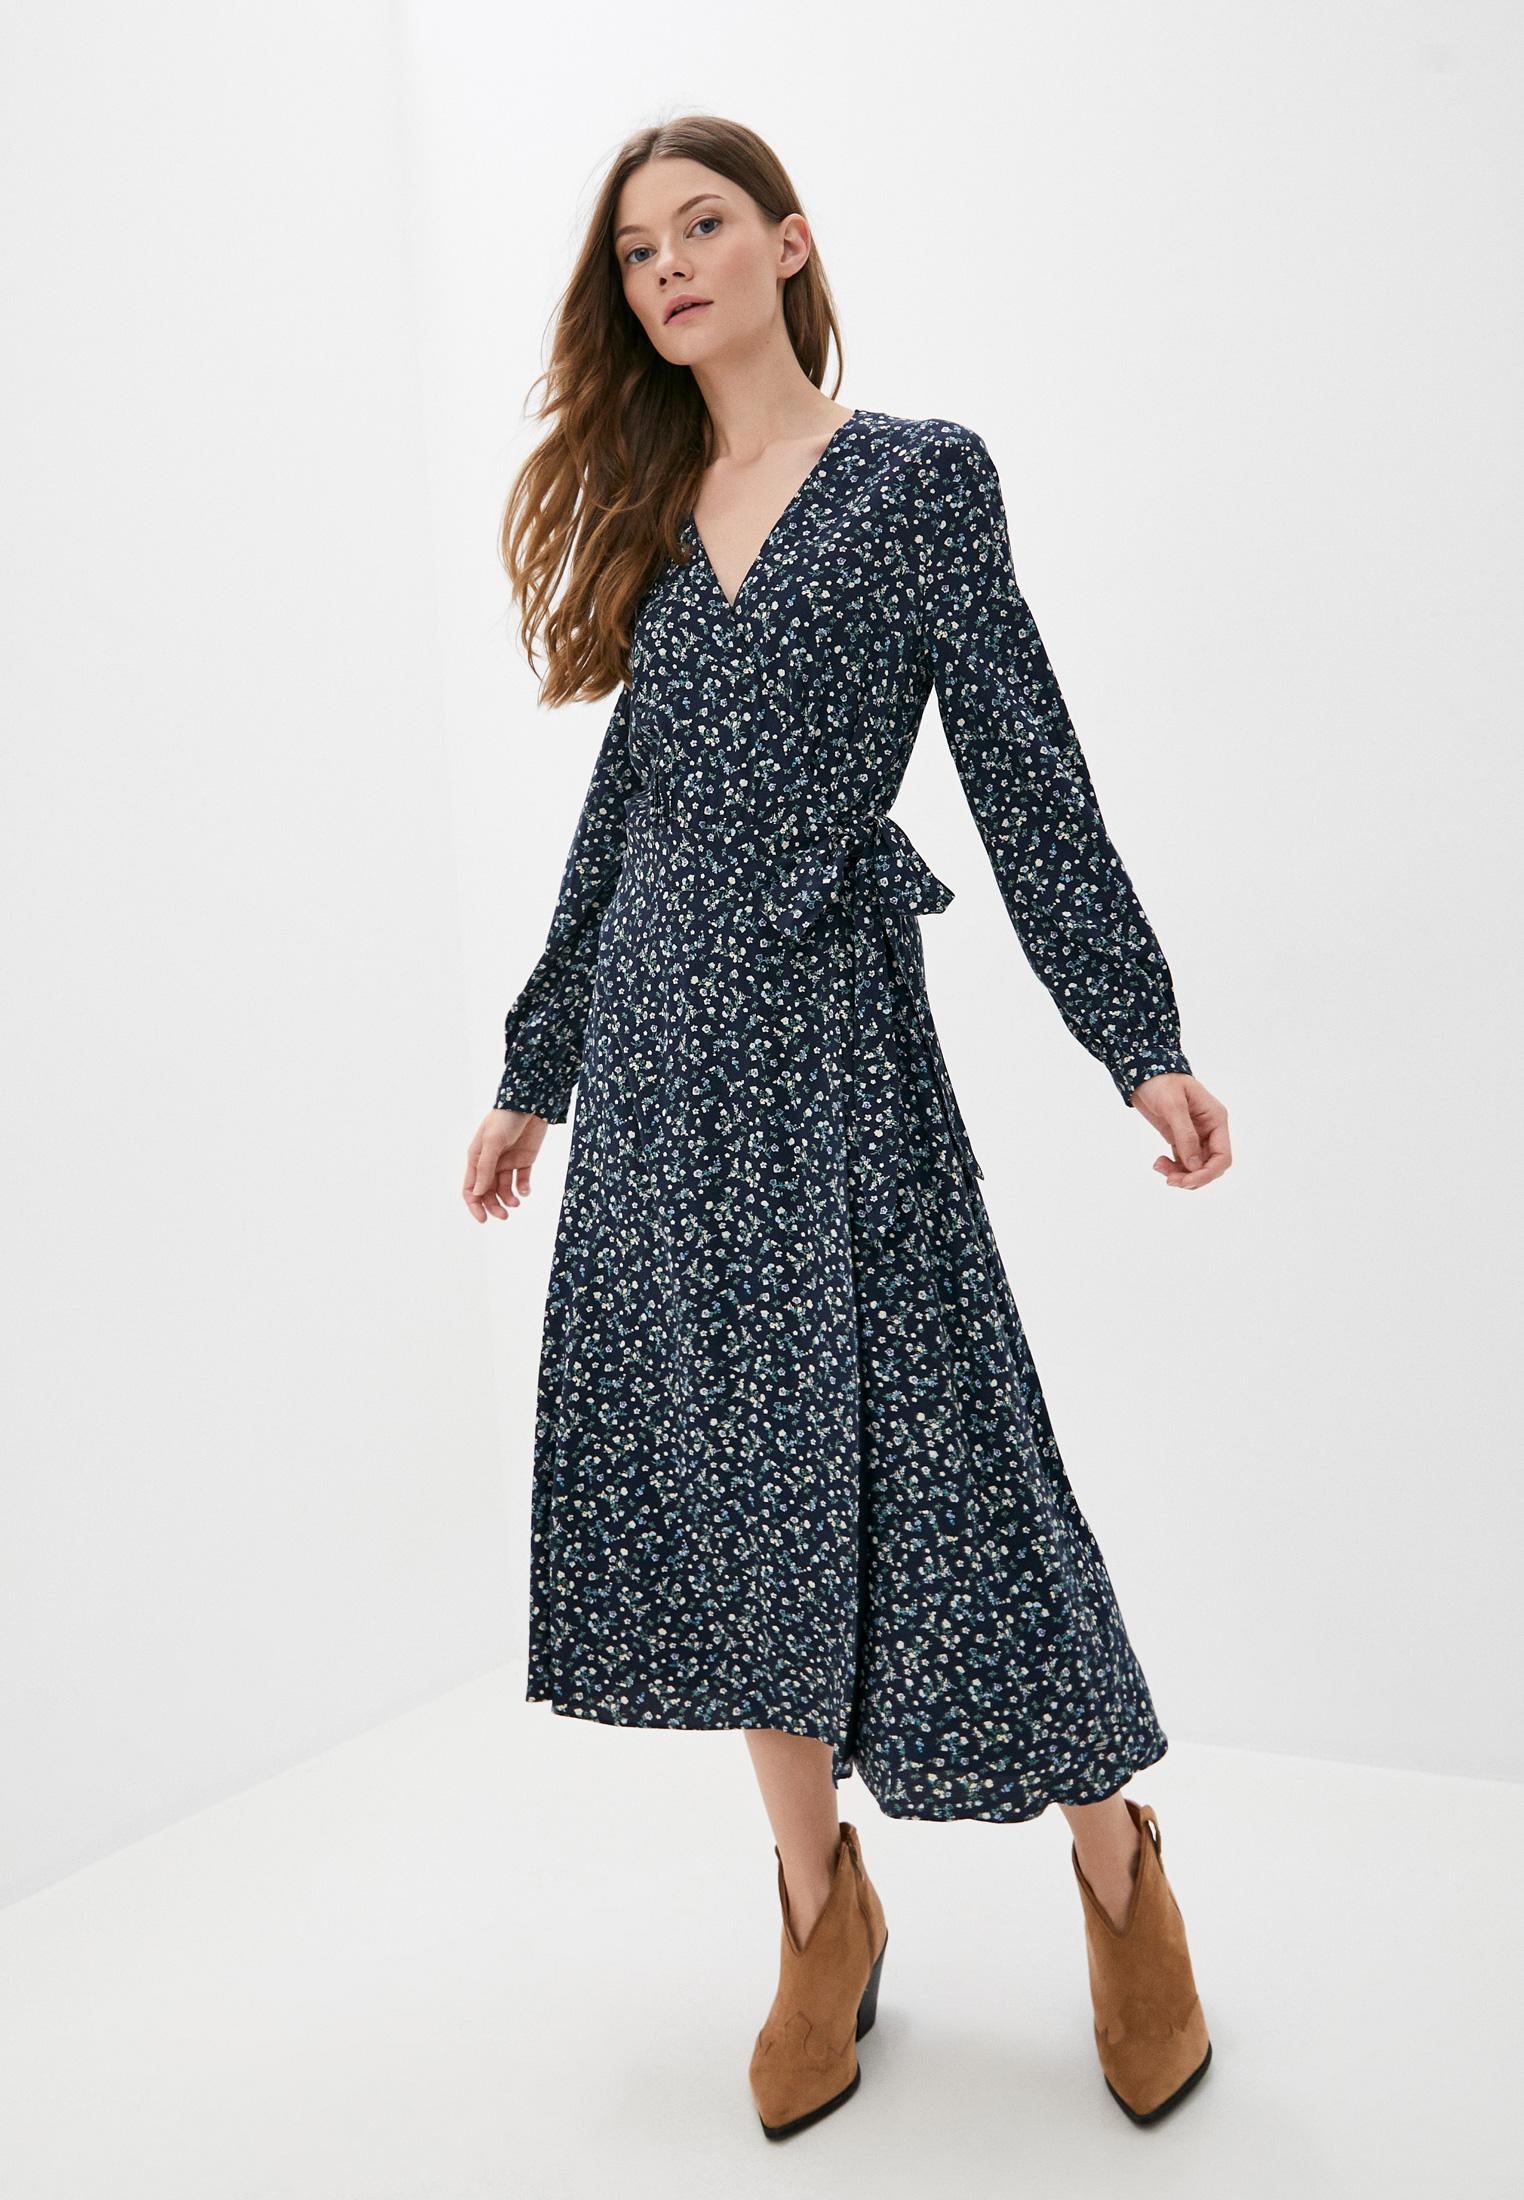 Платье Tommy Hilfiger (Томми Хилфигер) WW0WW28170